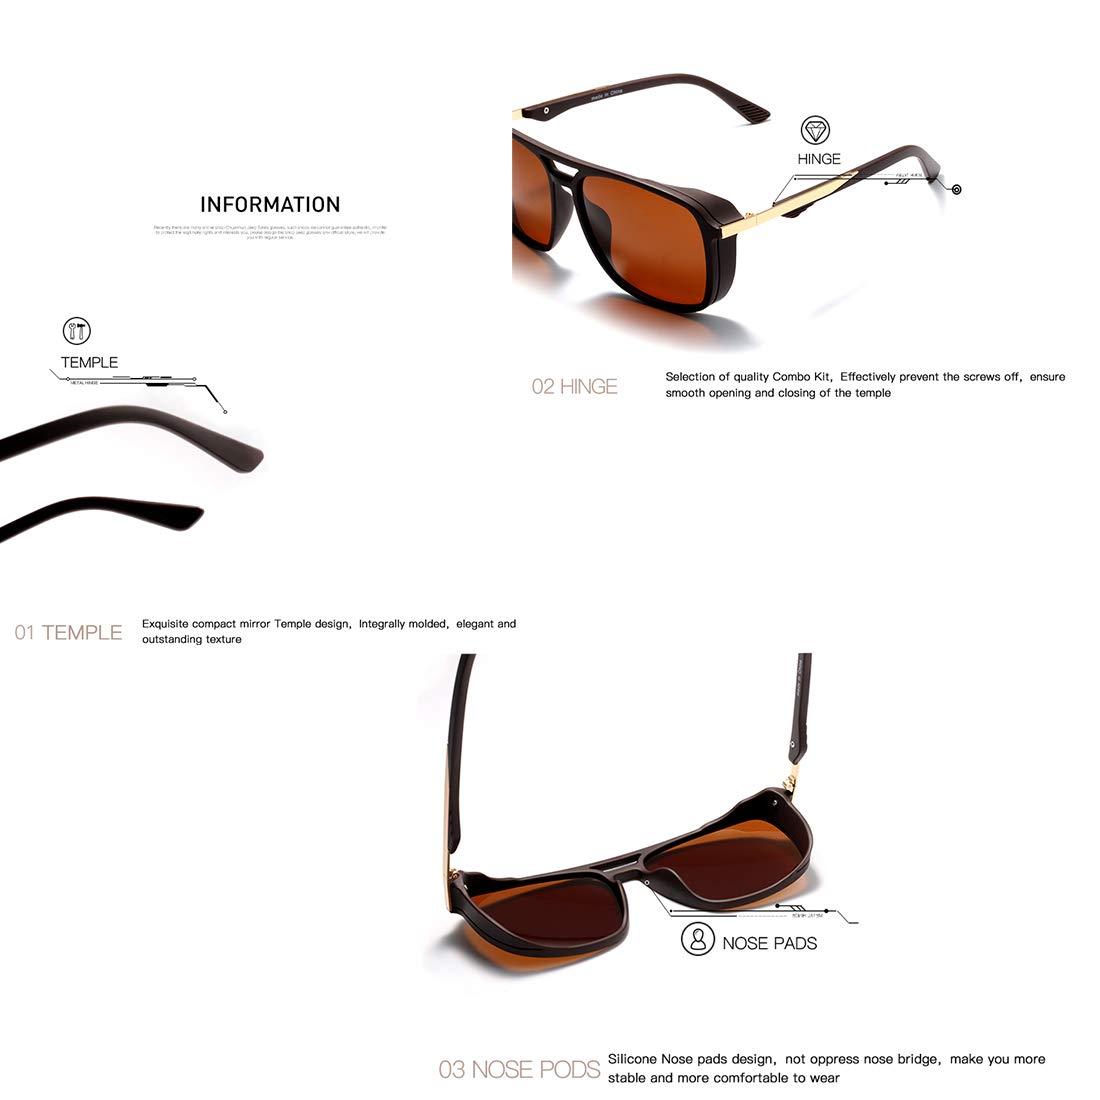 040547a6beb Kimorn Polarized Sunglasses For Men Square Frame Unisex Outdoor Sports  Goggle Classic K0623 (Brown)  Amazon.co.uk  Clothing